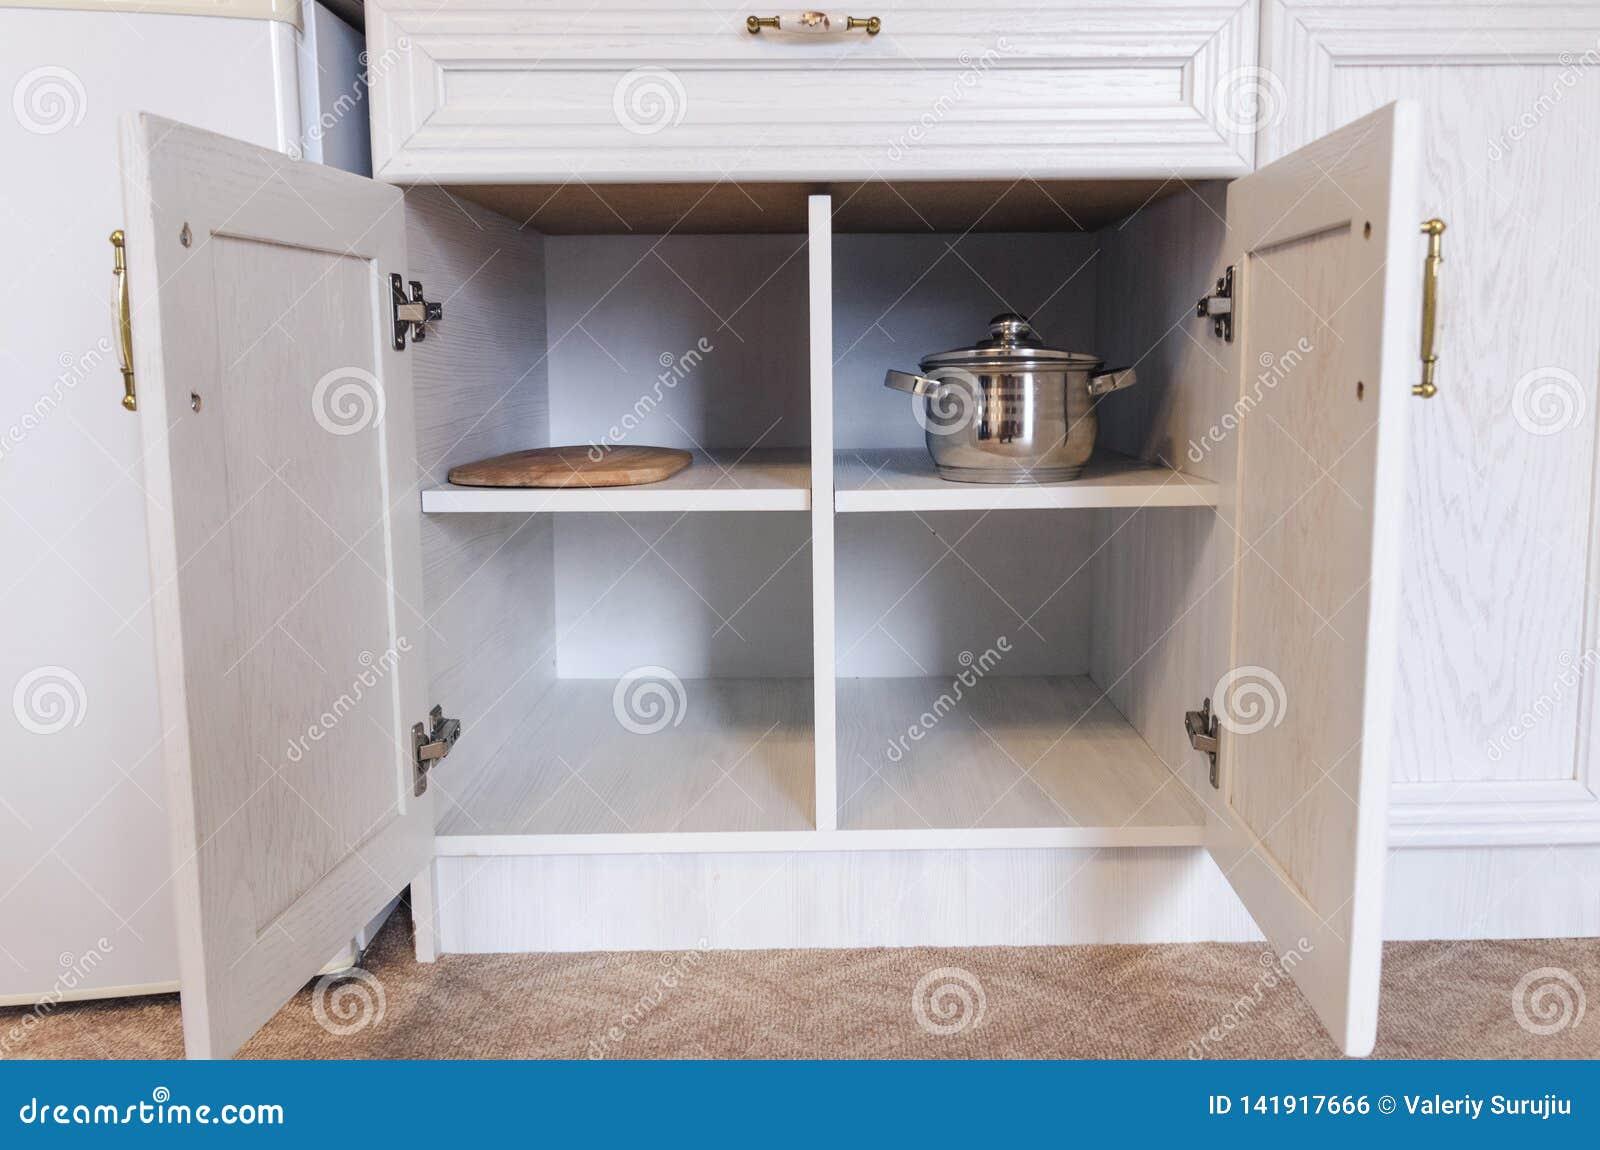 Kitchen Cabinet With Open Doors Stock Photo Image Of Corner Light 141917666